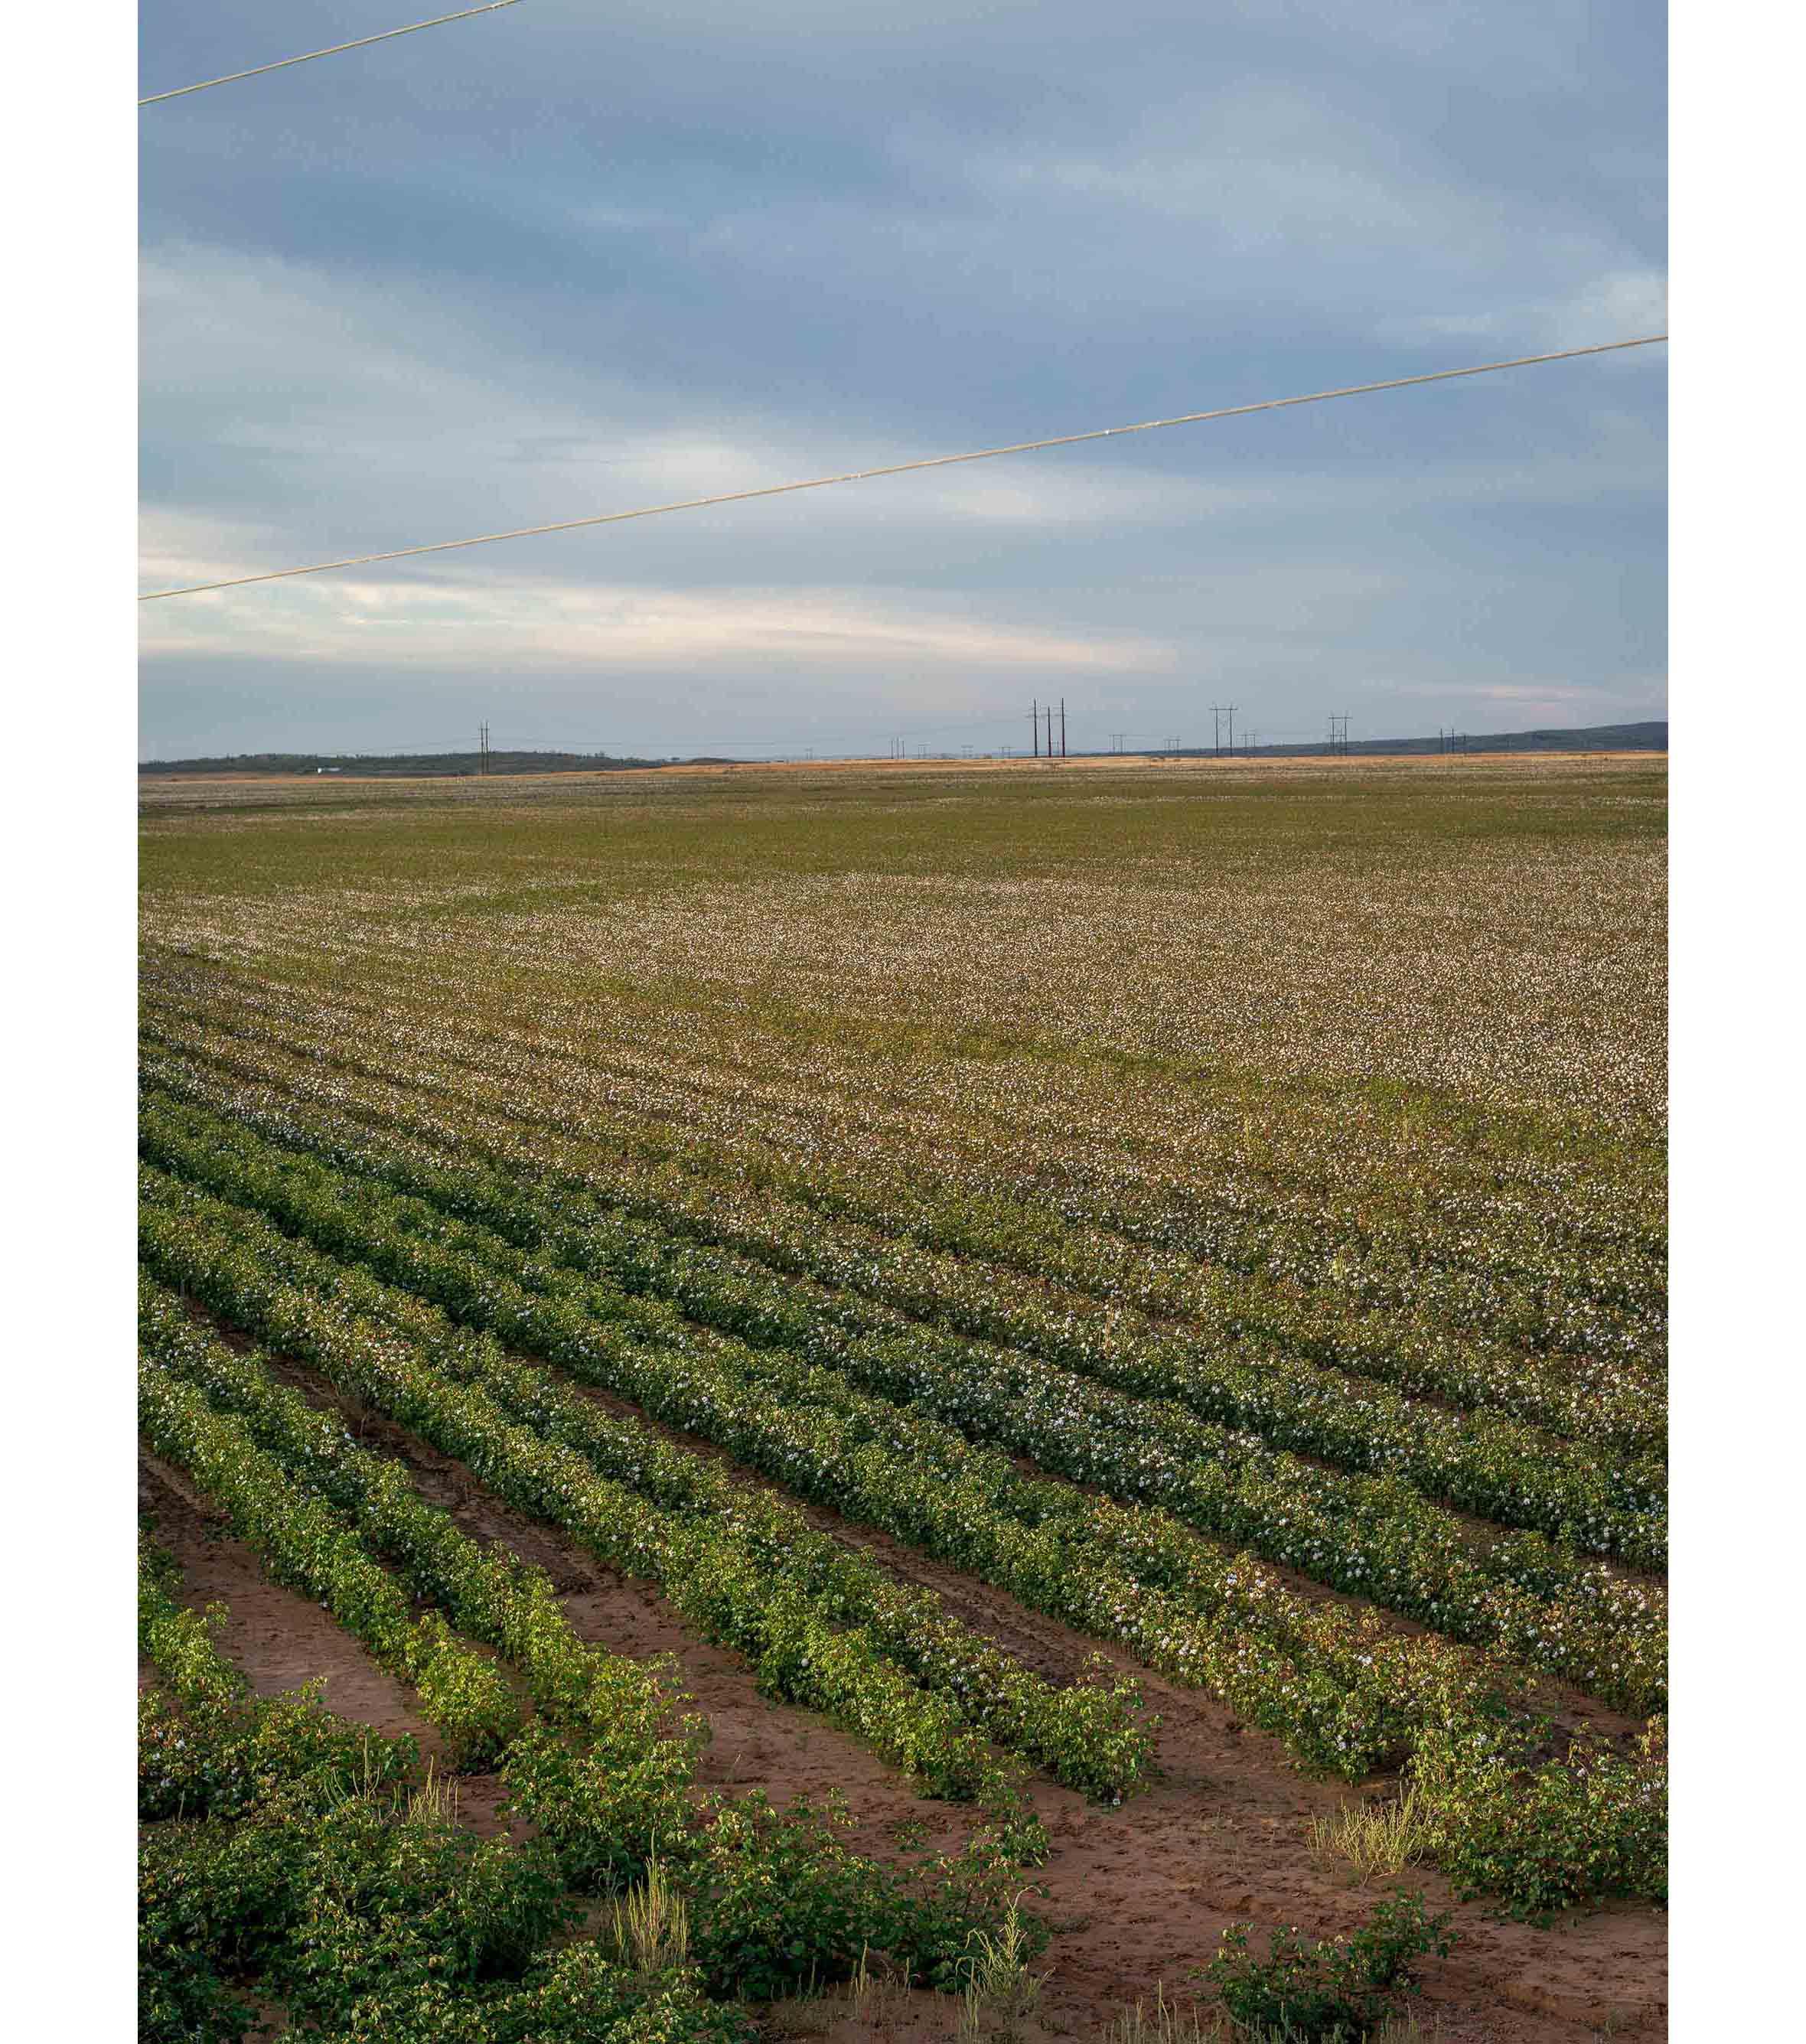 Cottonfields07.jpg